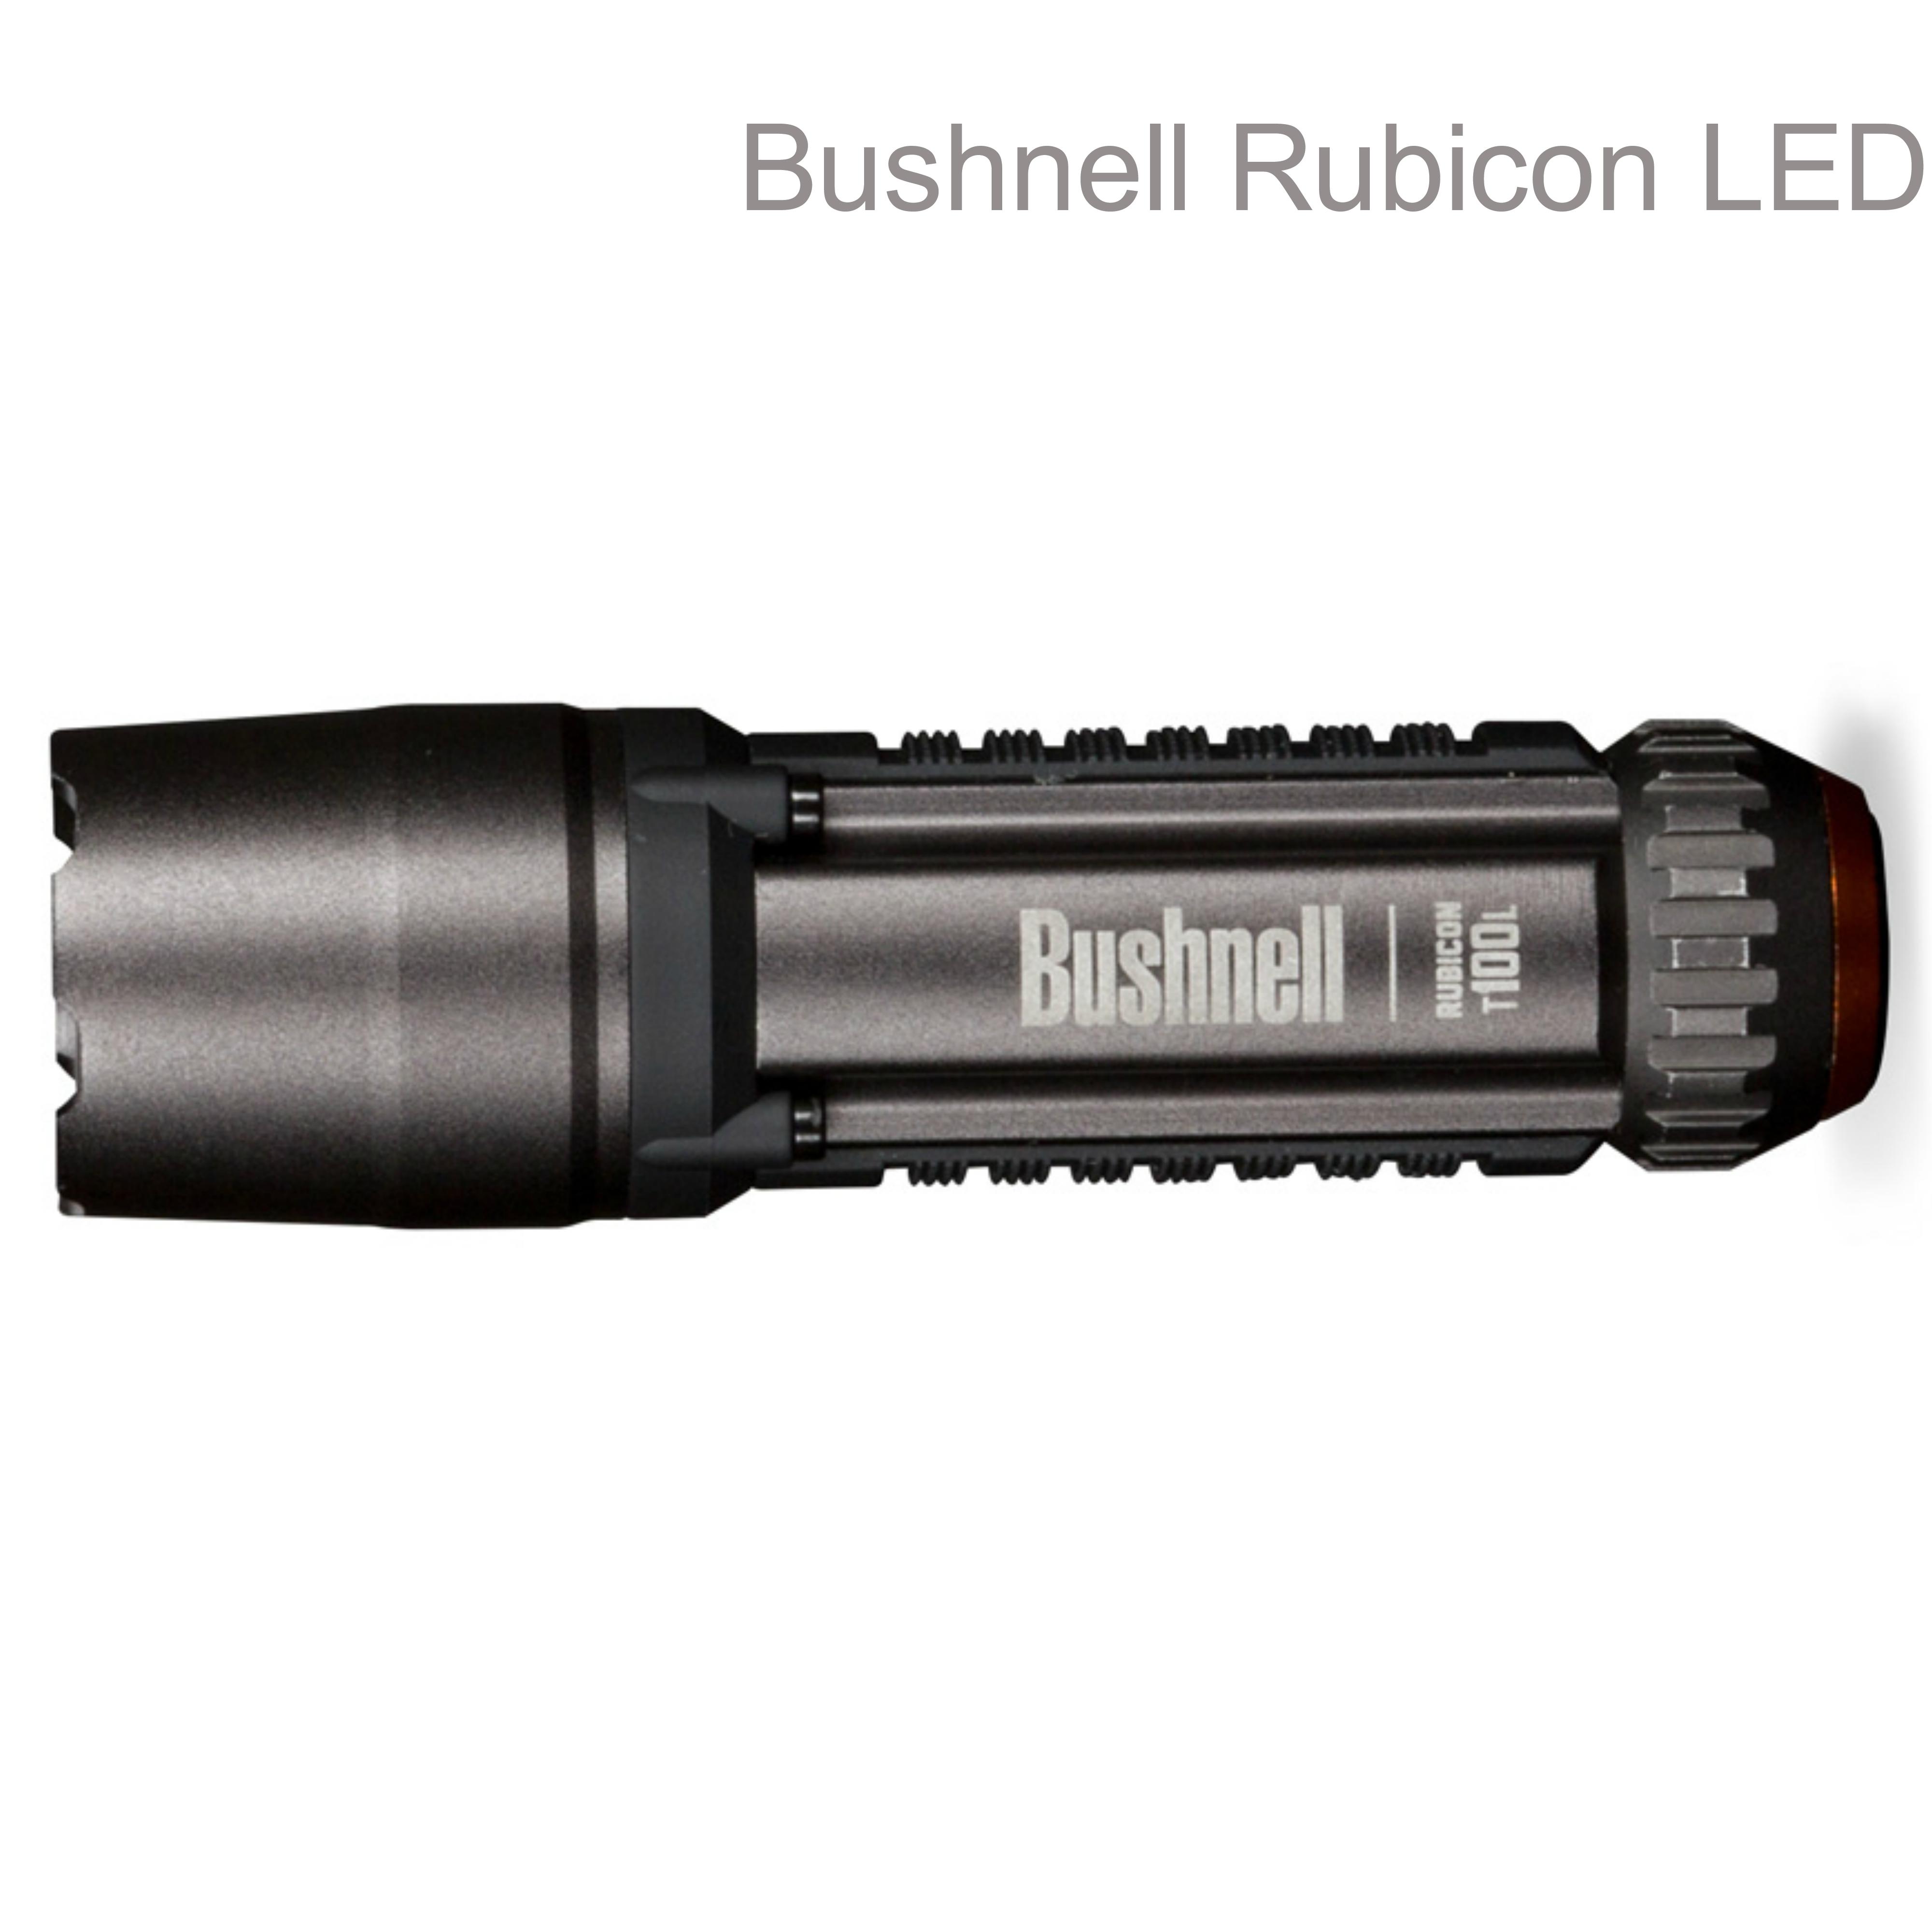 Bushnell Rubicon T100ML LED Flashlight|1AA - 152 Lumens|T.I.R.Optic|IPX-4